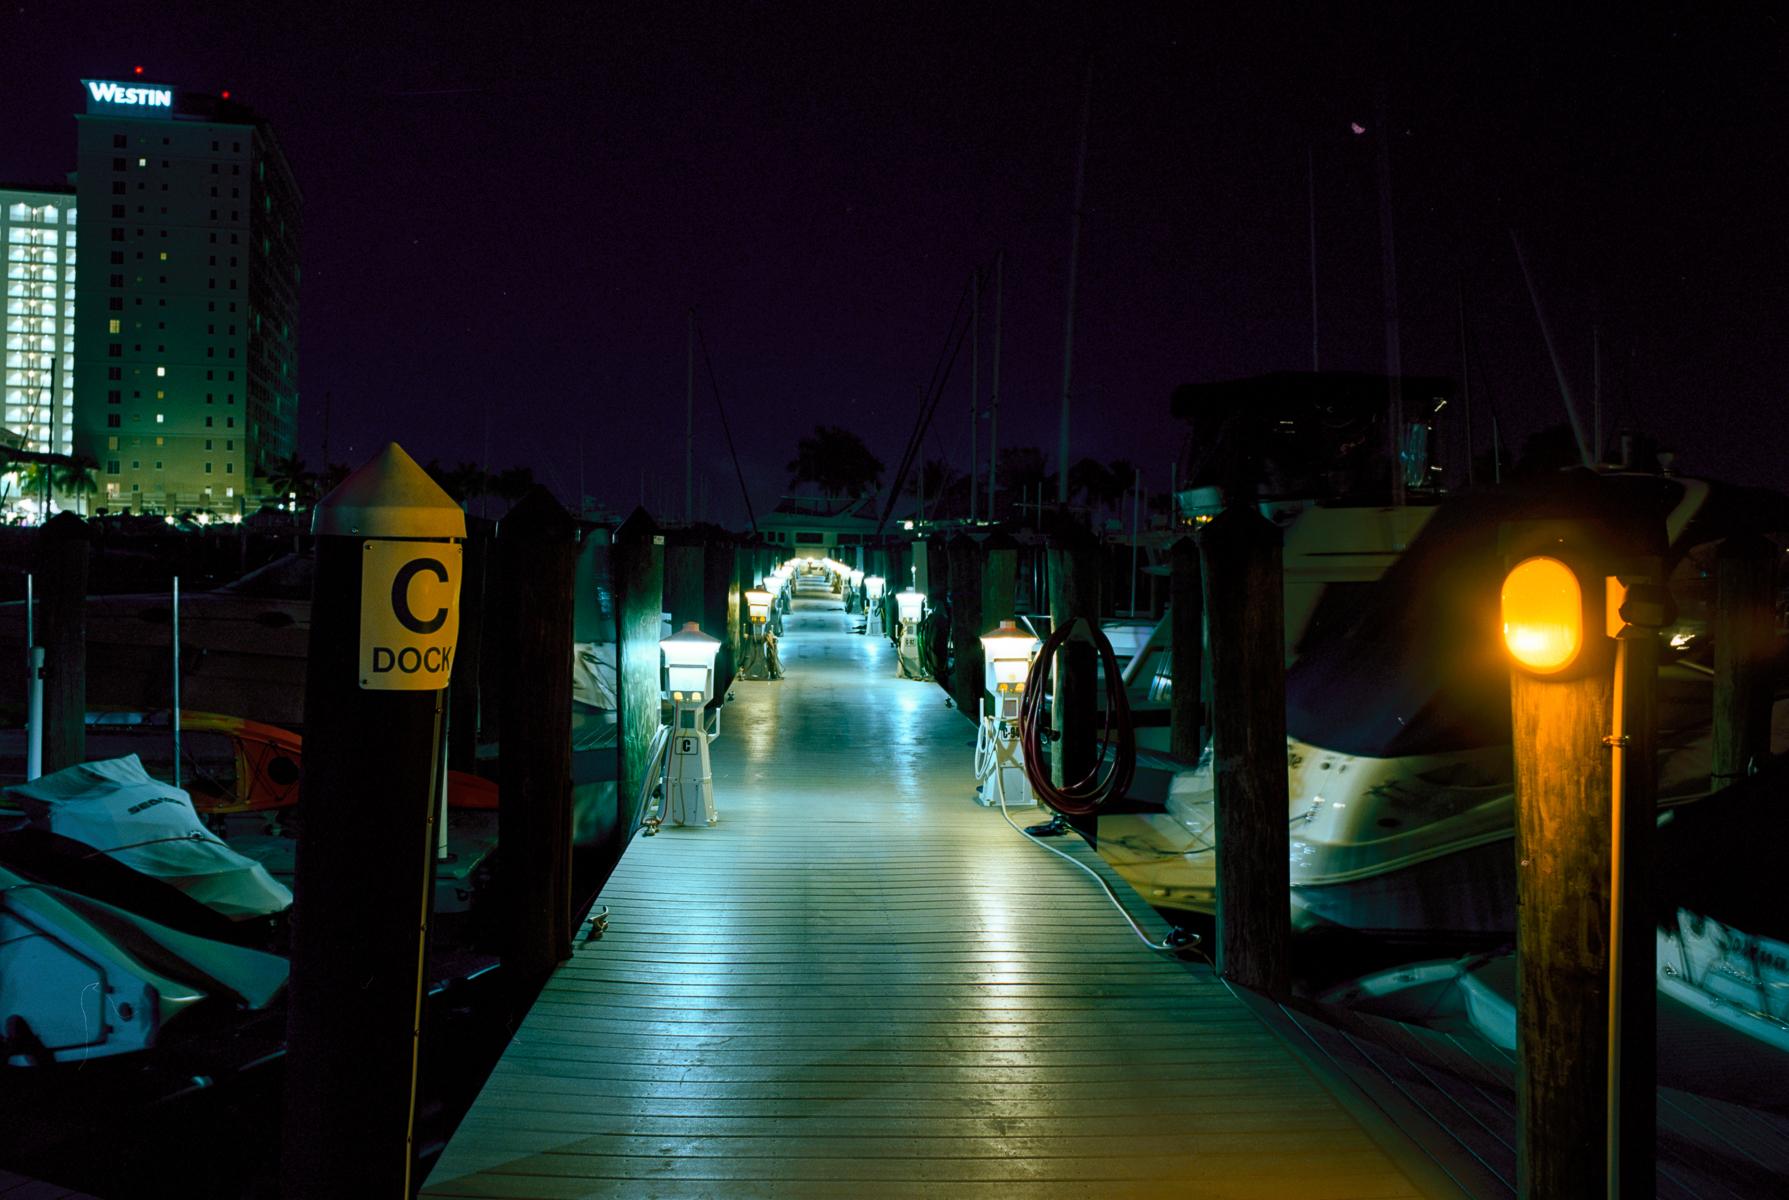 Robert Rogers | Dock C at Night | Mamiya 645 Pro TL | 45mm lens 1 min 8sec @ f-16 | Kodak Ektar 100